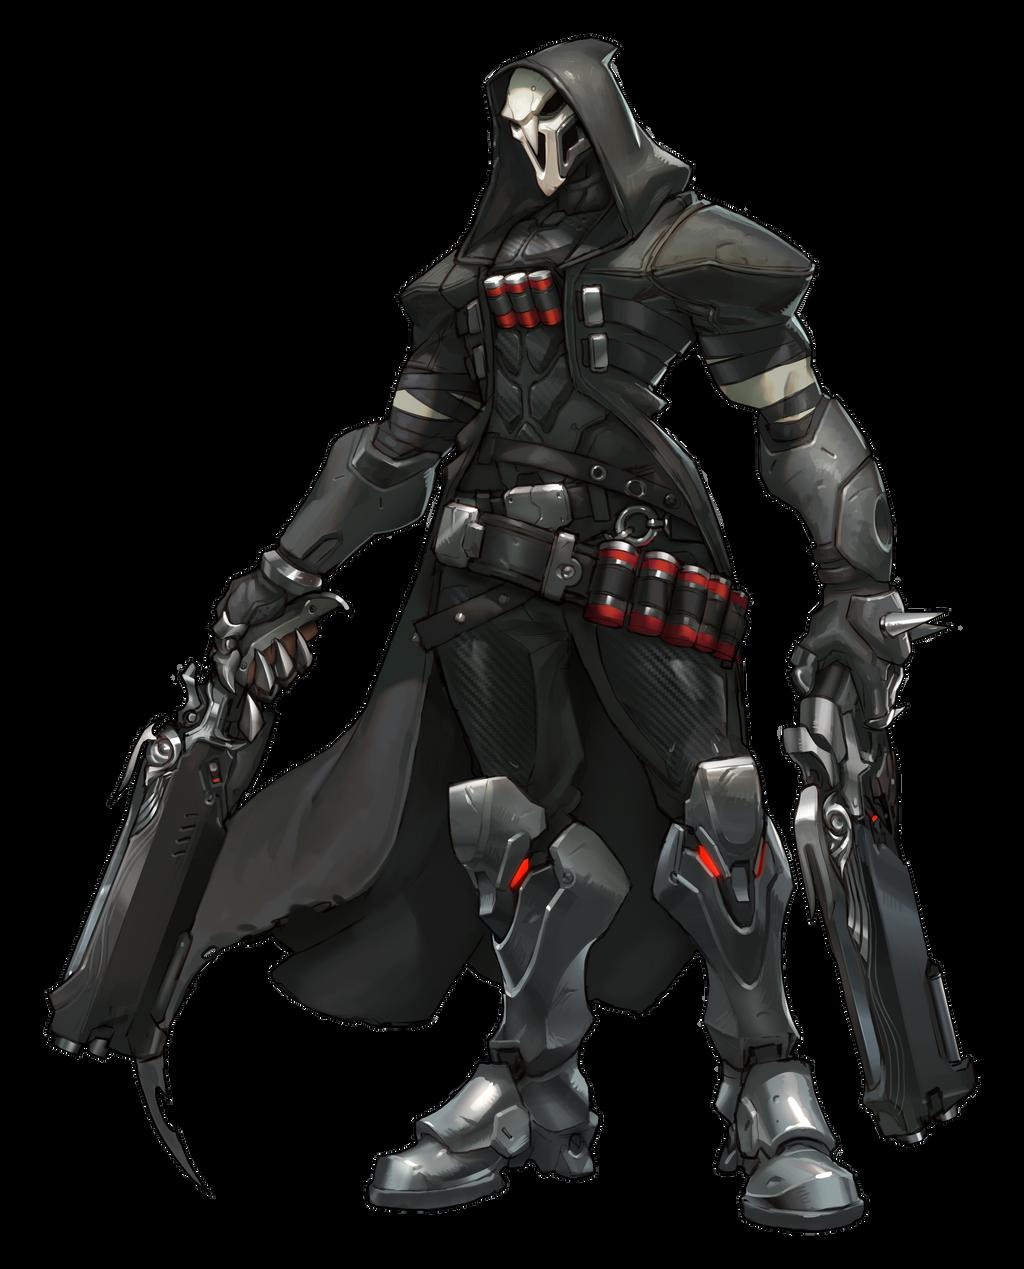 reaper___overwatch_by_plank_69-d97zxzk.p